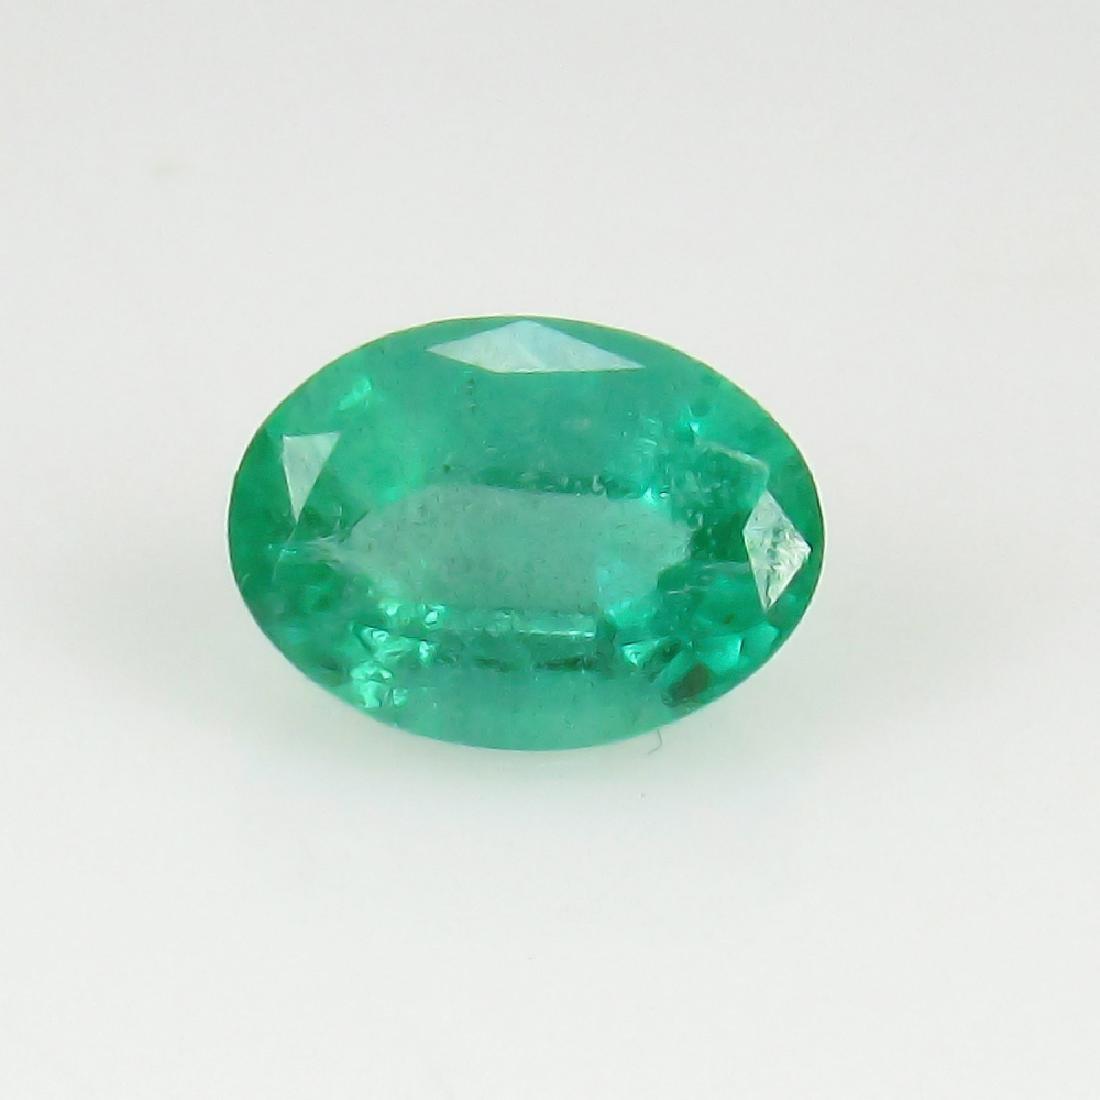 0.94 Ct IGI Certified Genuine Zambian Emerald Nice Oval